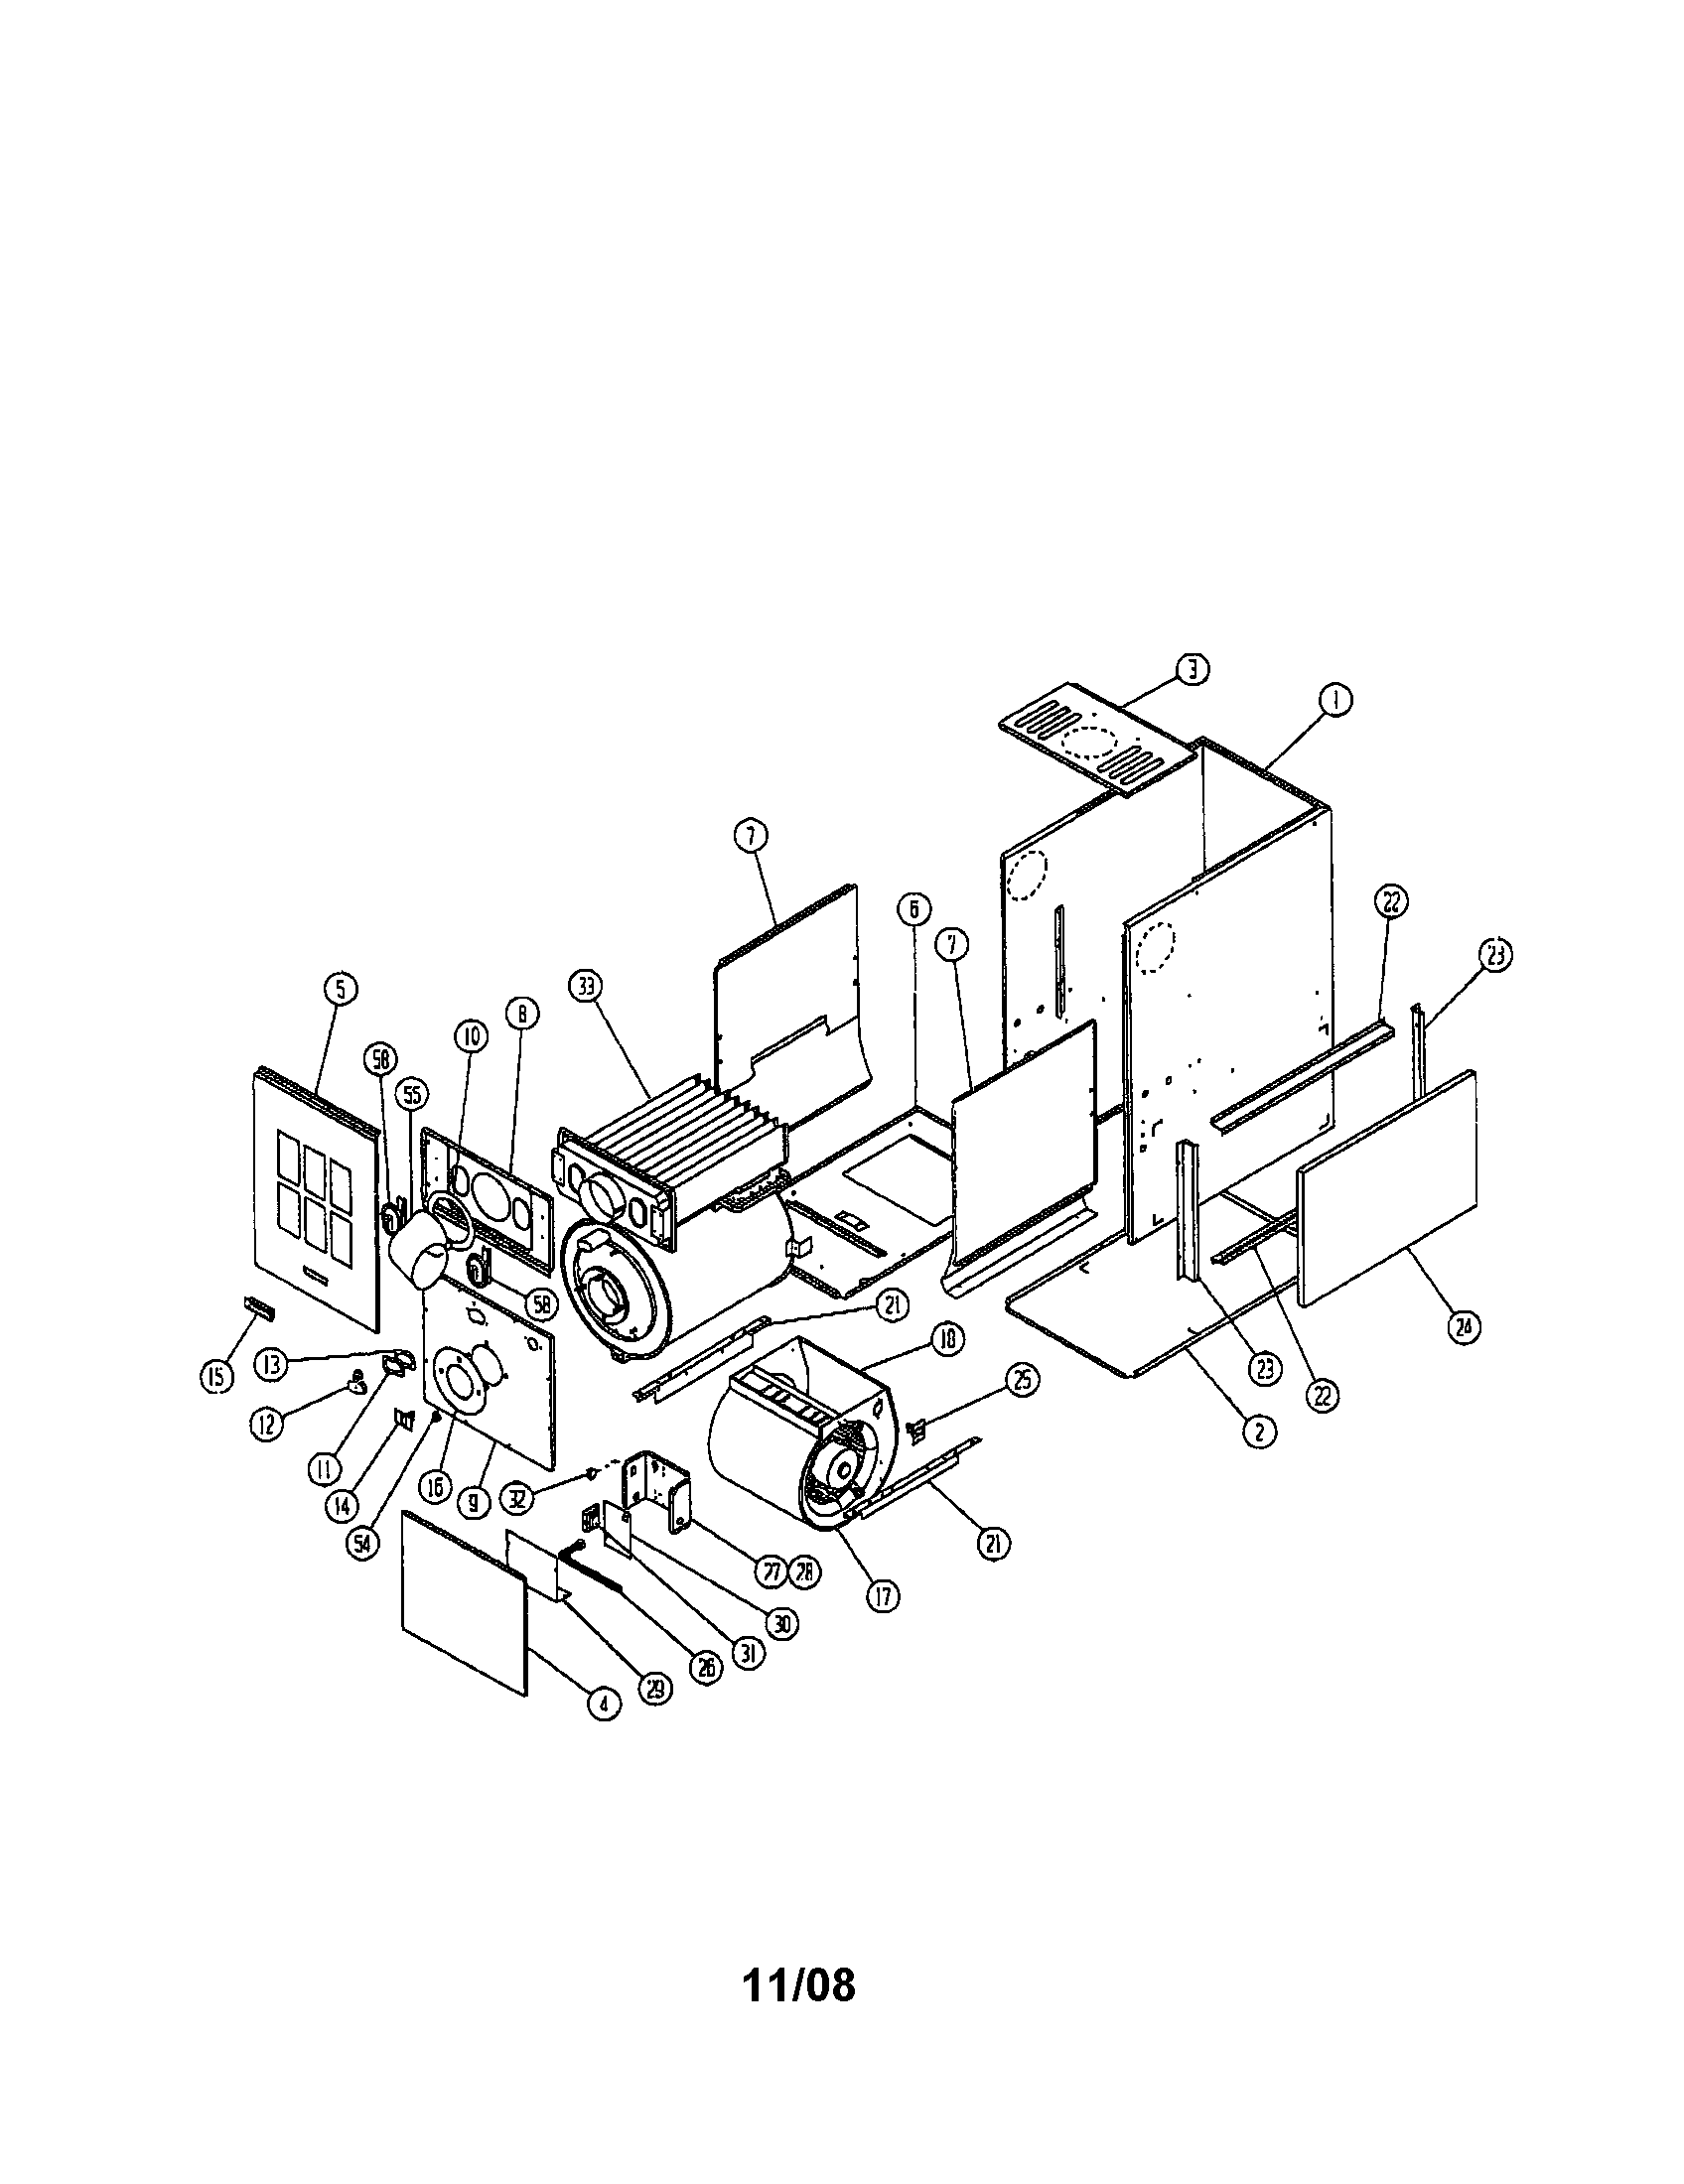 ducane oil furnace wiring diagram vauxhall astra towbar database old best library older model